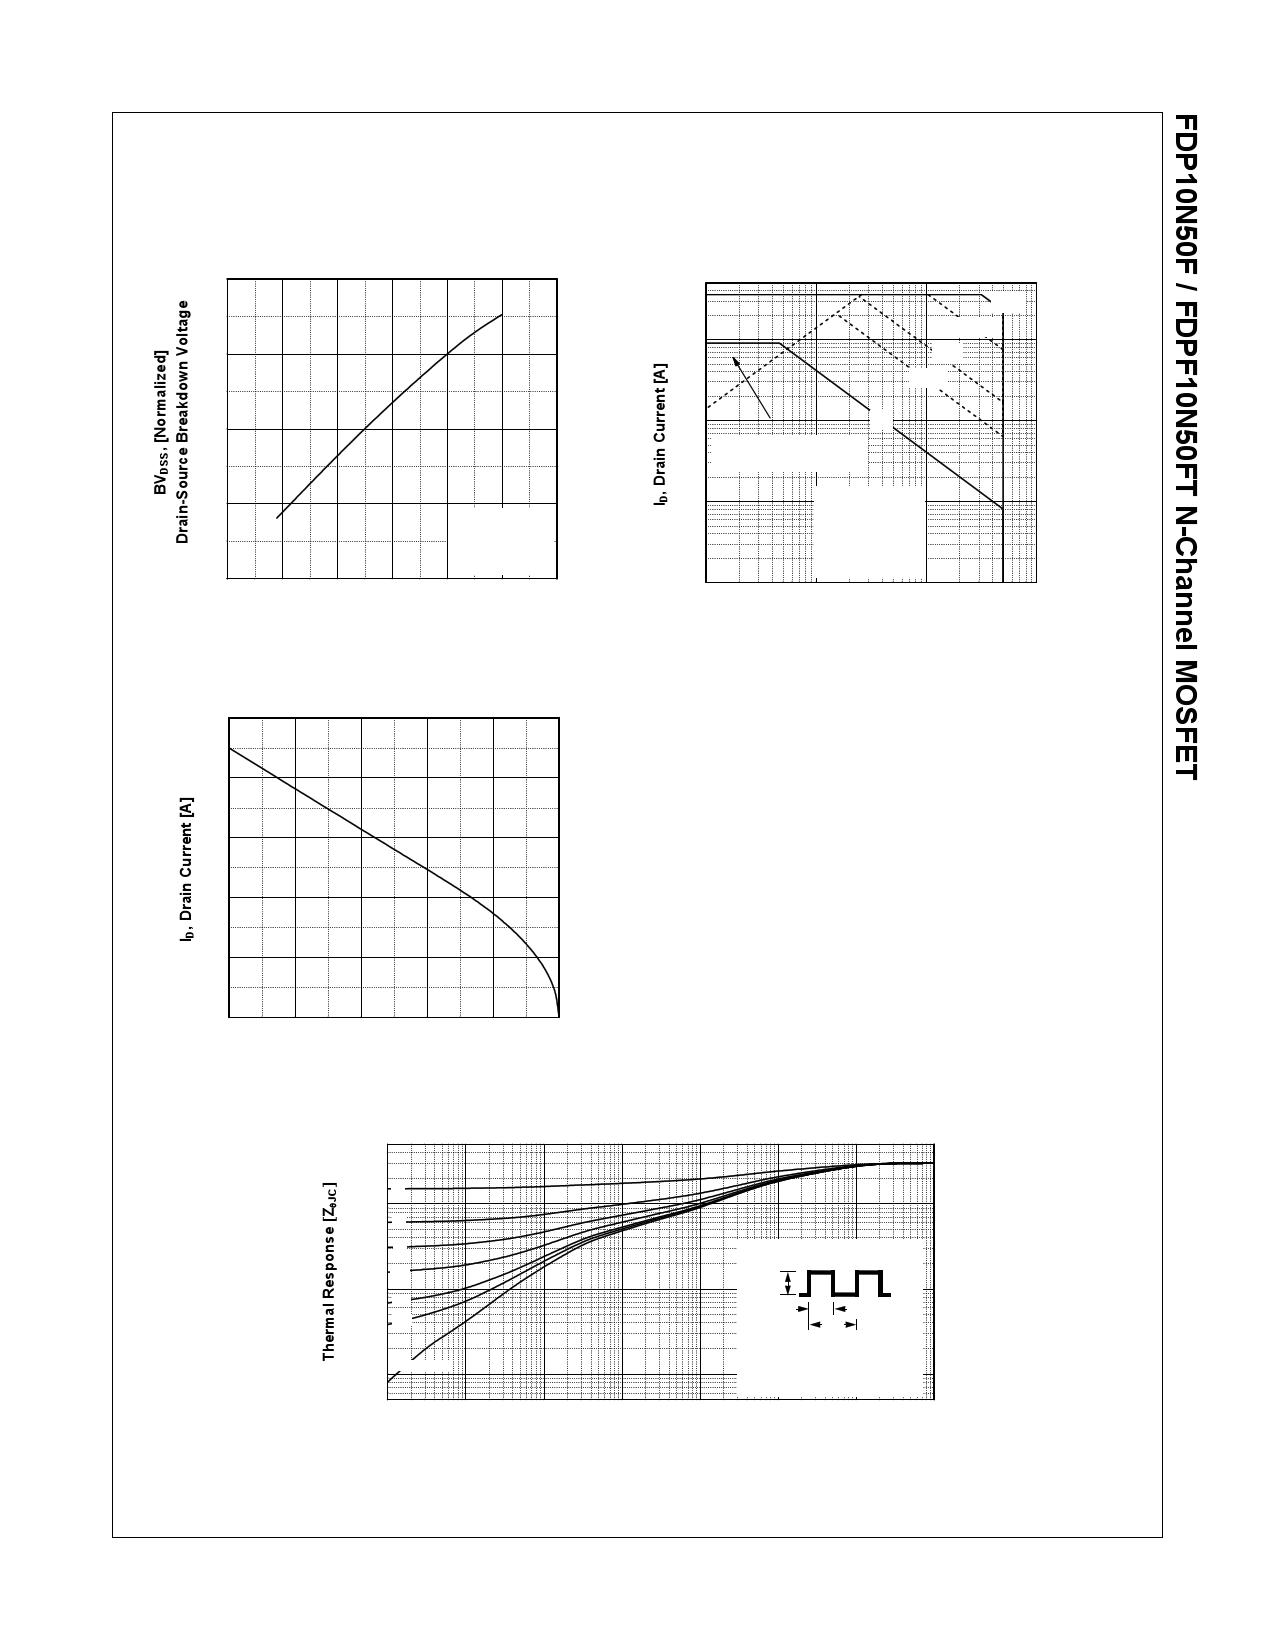 FDPF10N50FT pdf, 반도체, 판매, 대치품